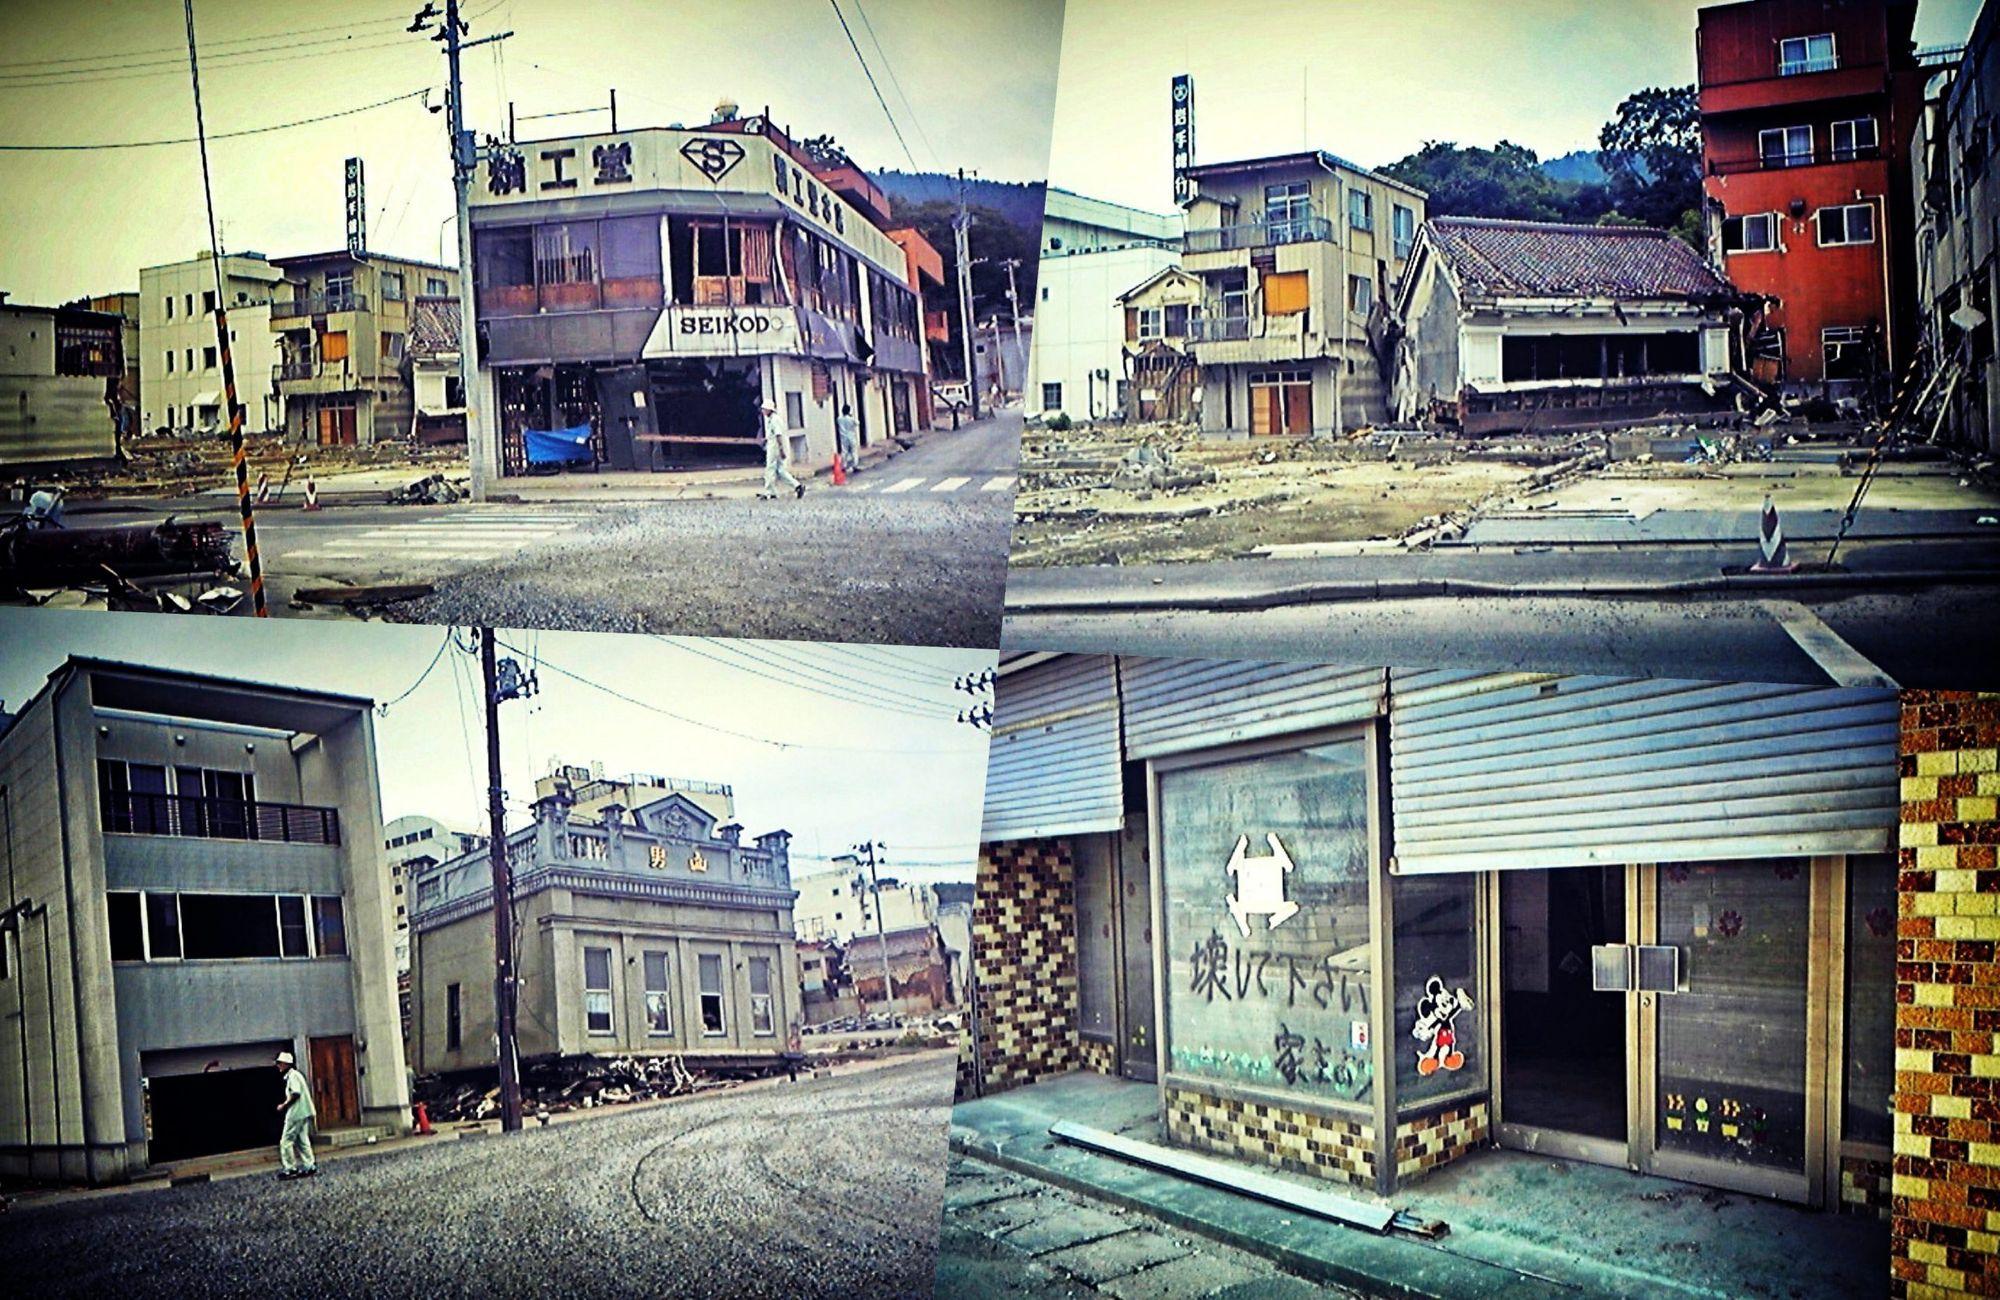 Zum 3. Jahrestag des Tohoku – Erdbebens